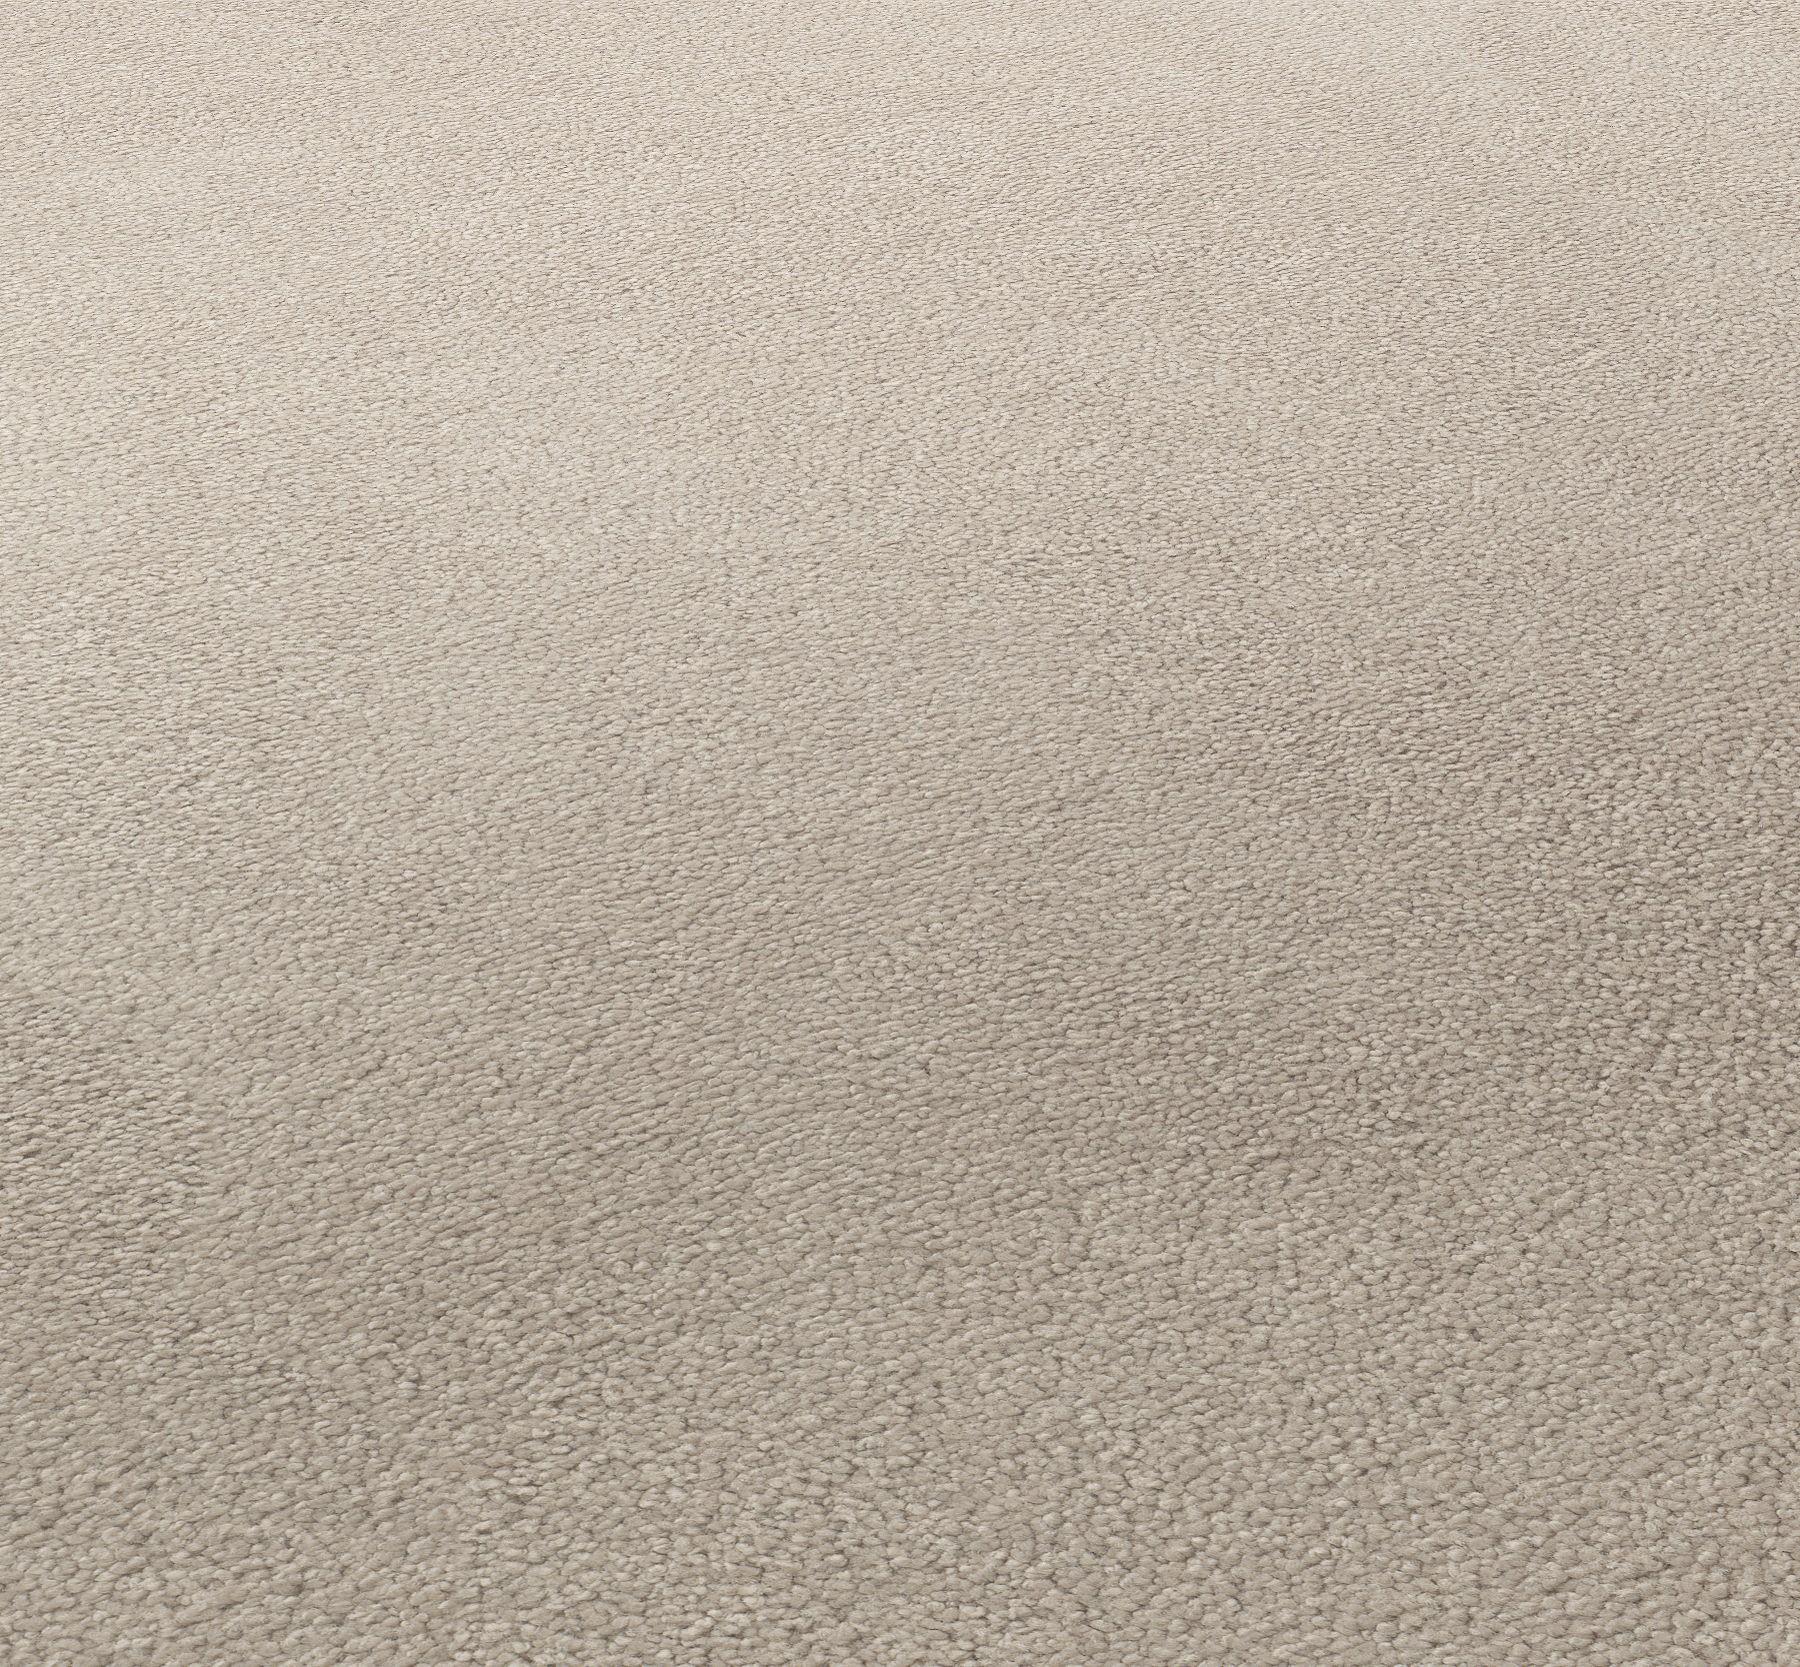 moquette soft 3566 971 jab anstoetz flooring. Black Bedroom Furniture Sets. Home Design Ideas